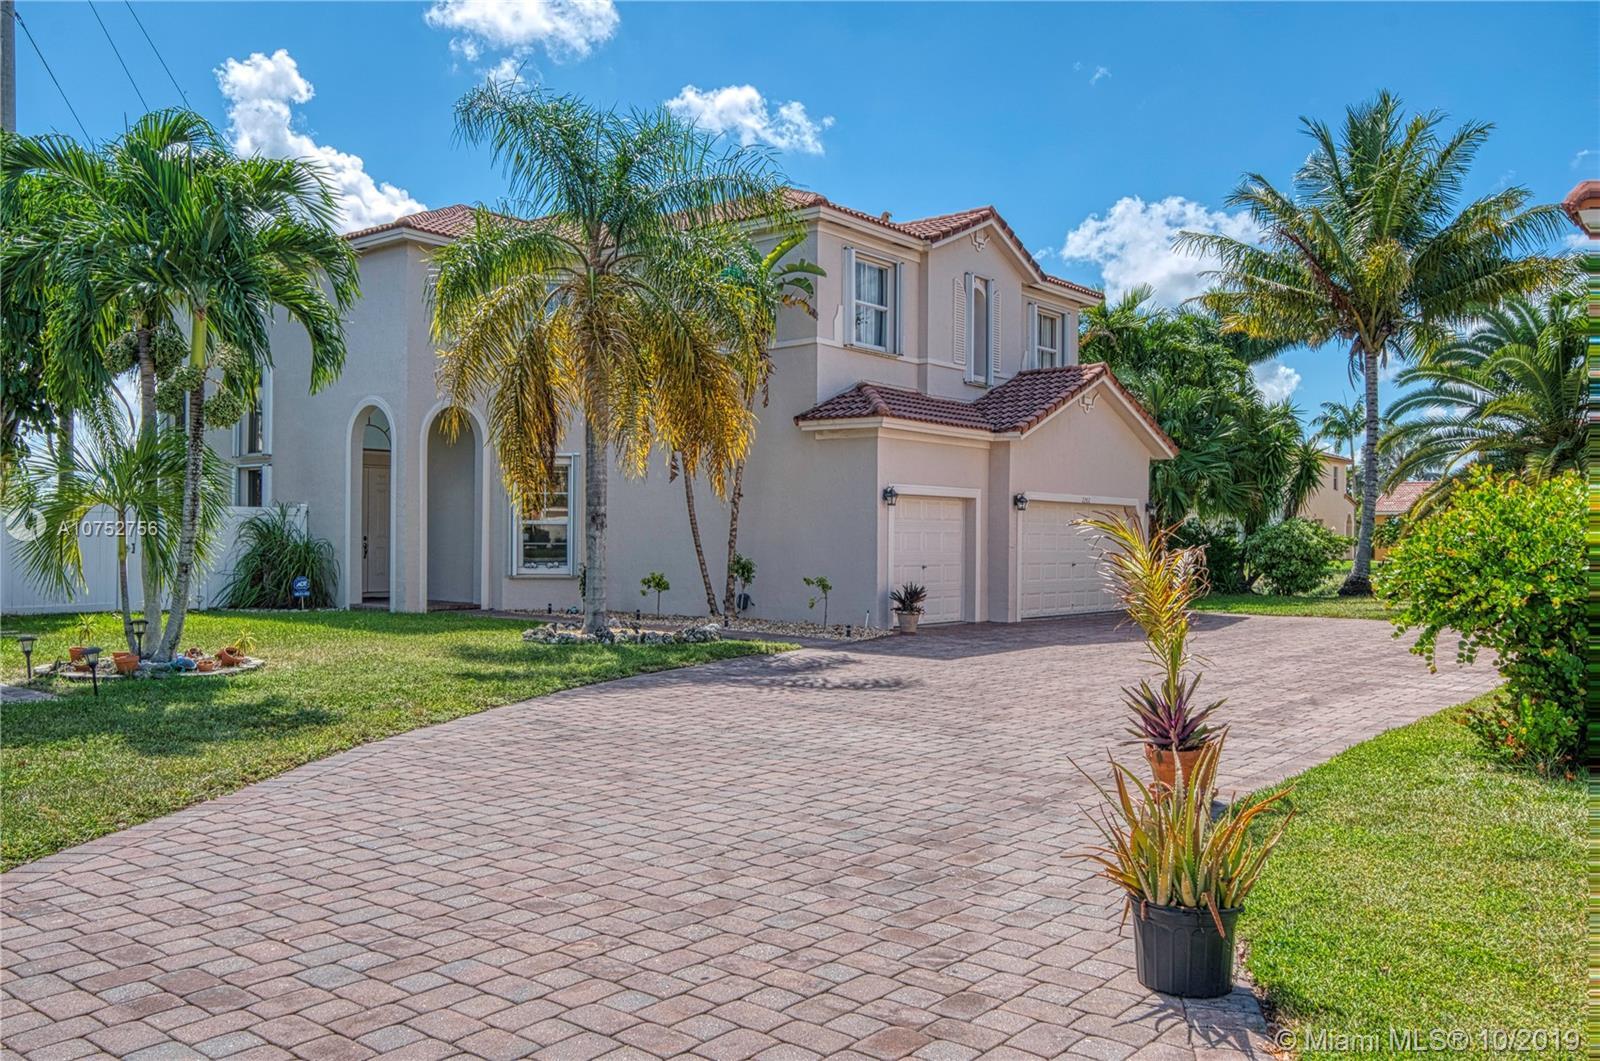 2202 NE 41st Ave, Homestead, Florida